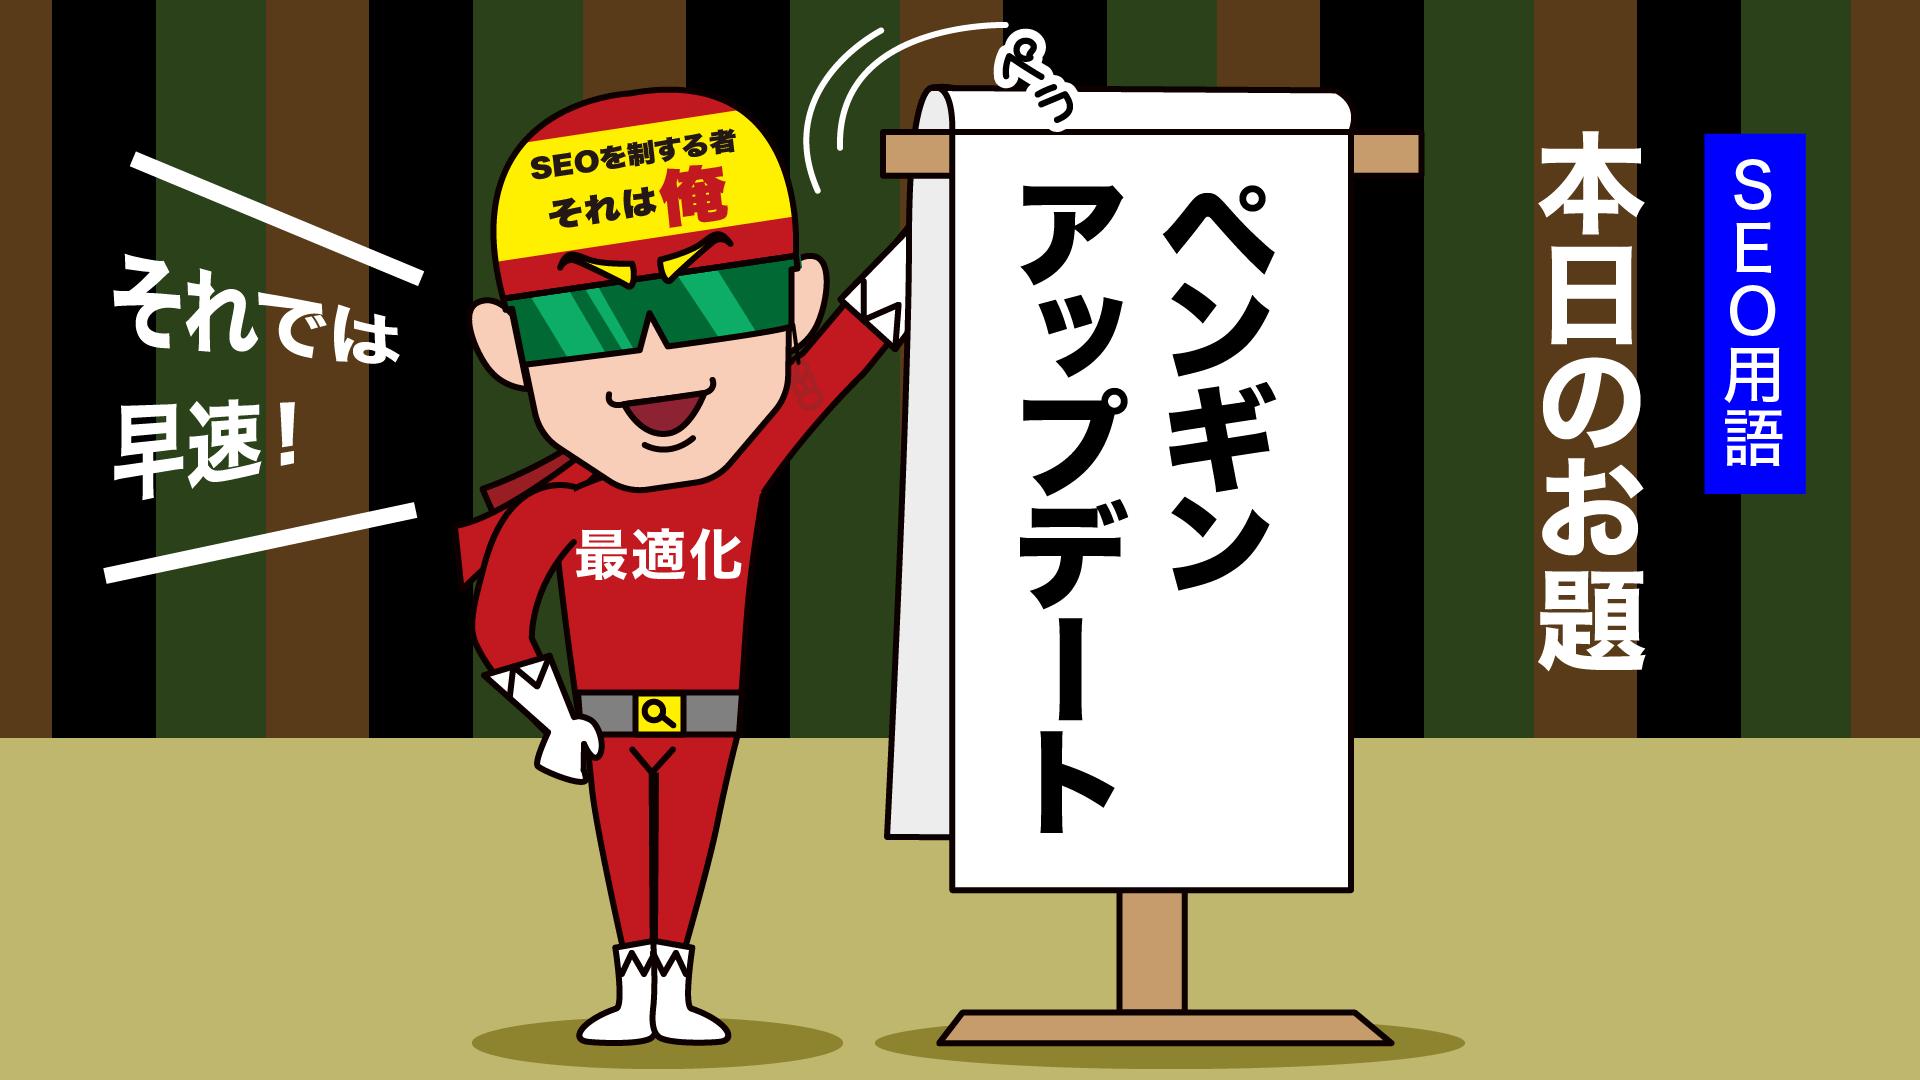 SEO用語集漫画‐ペンギンアップデート②